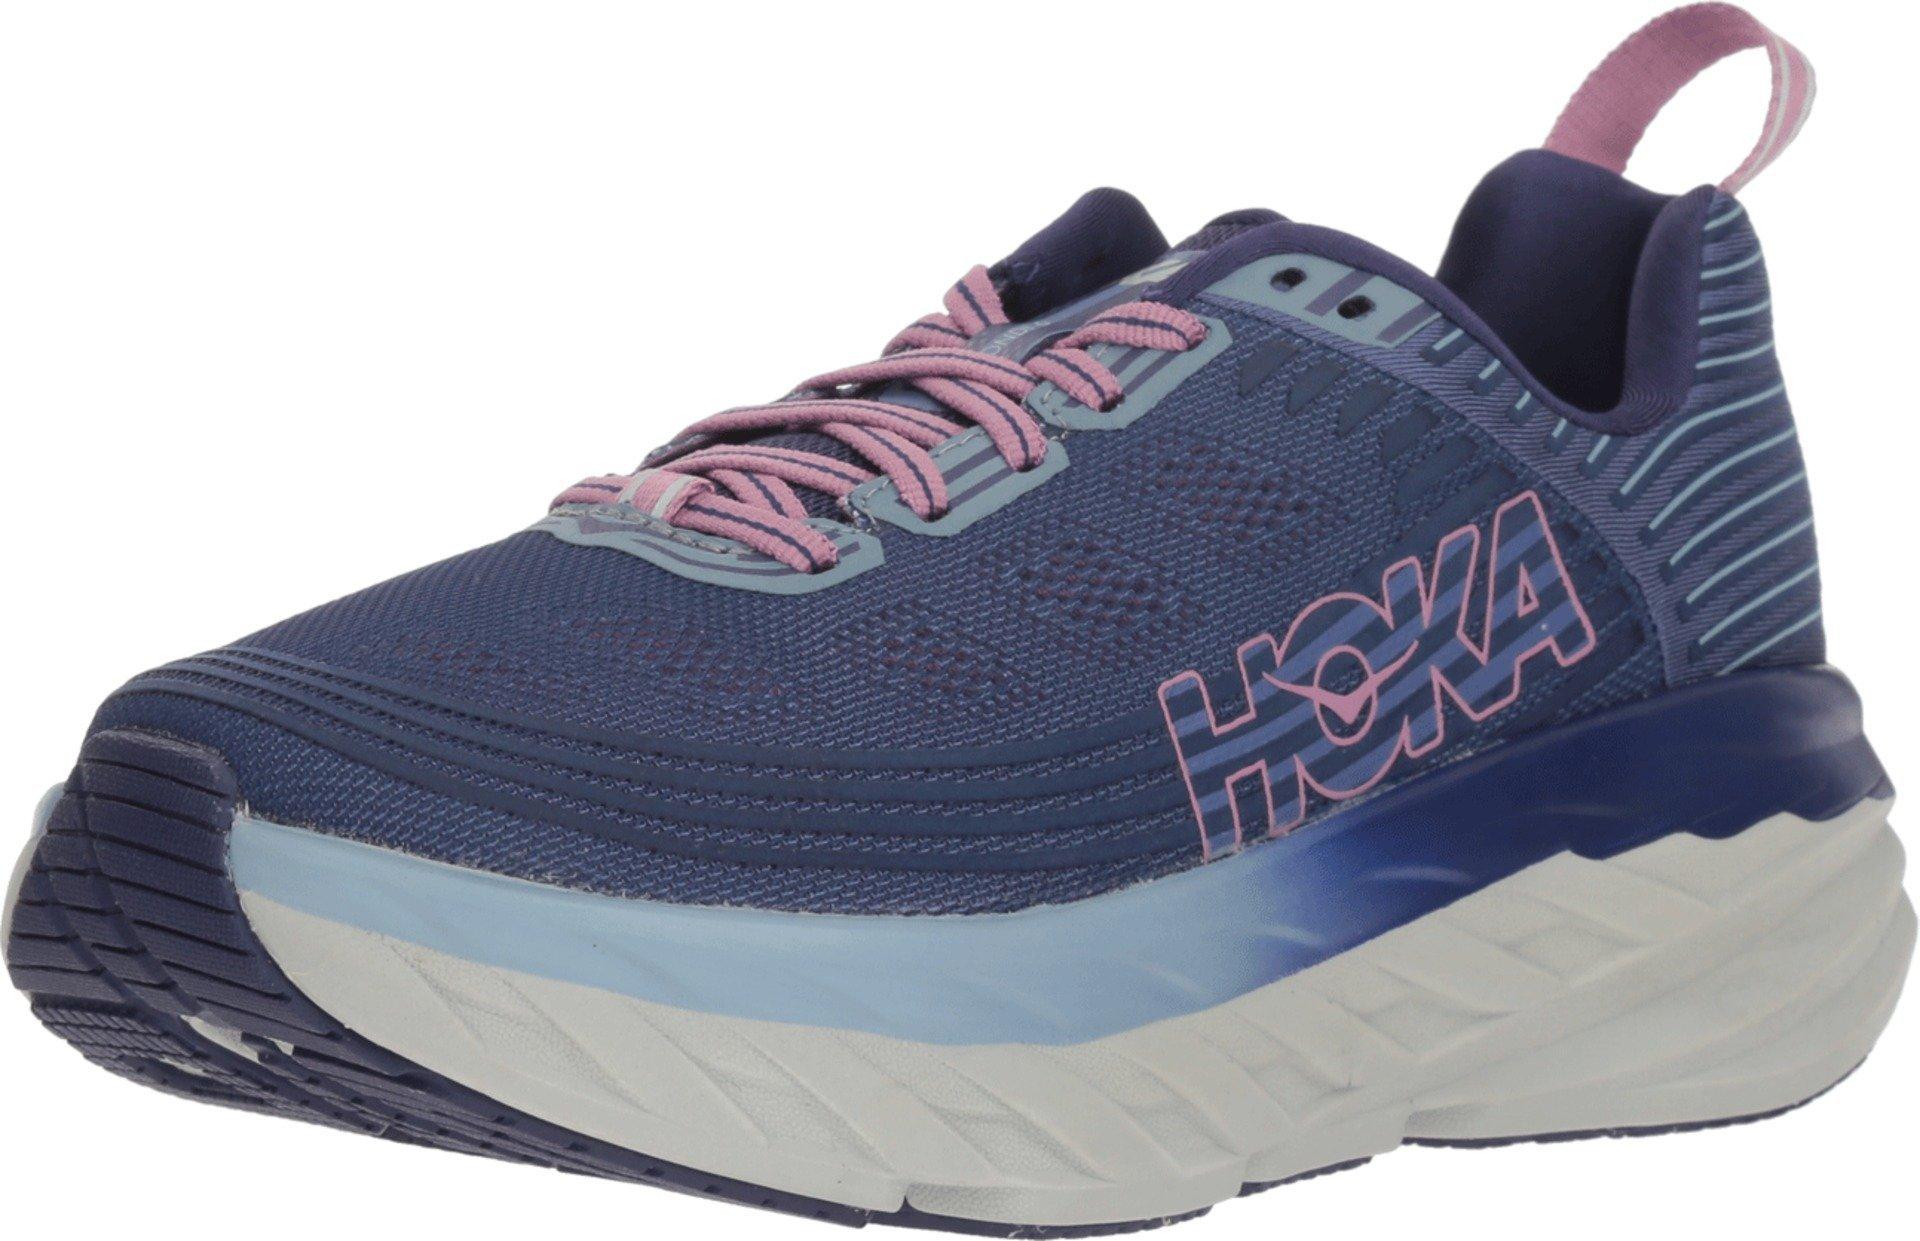 HOKA ONE ONE Womens Bondi 6 Marlin/Blue Ribbon Running Shoe - 5.5